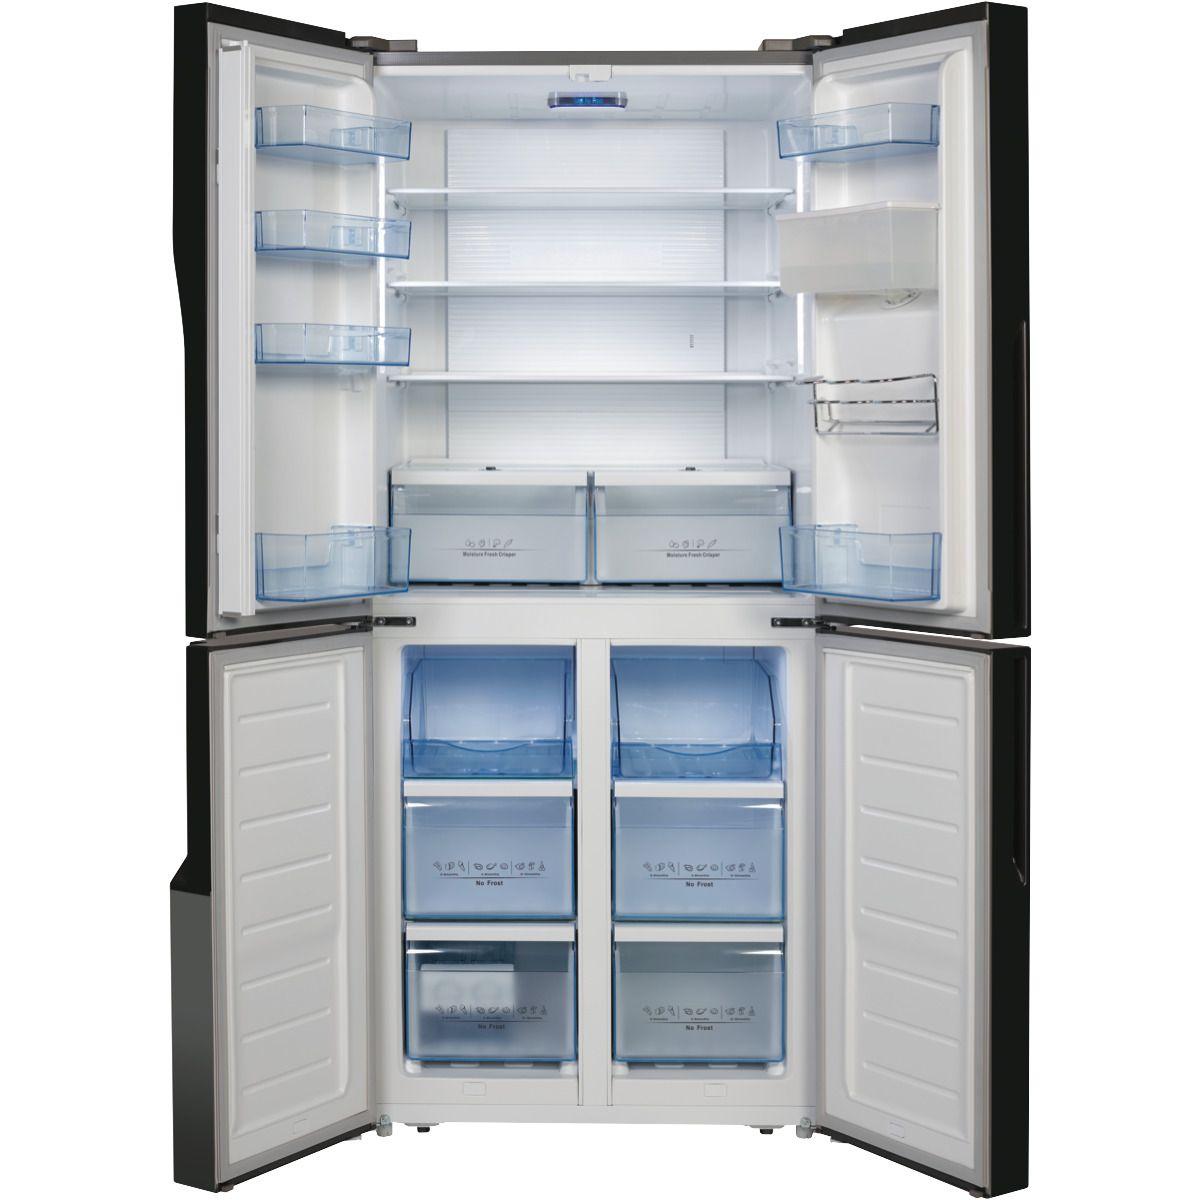 Hisense Hr6cdff509sw 509l French Door Refrigerator At The Good Guys American Fridge American Fridge Freezers American Style Fridge Freezer